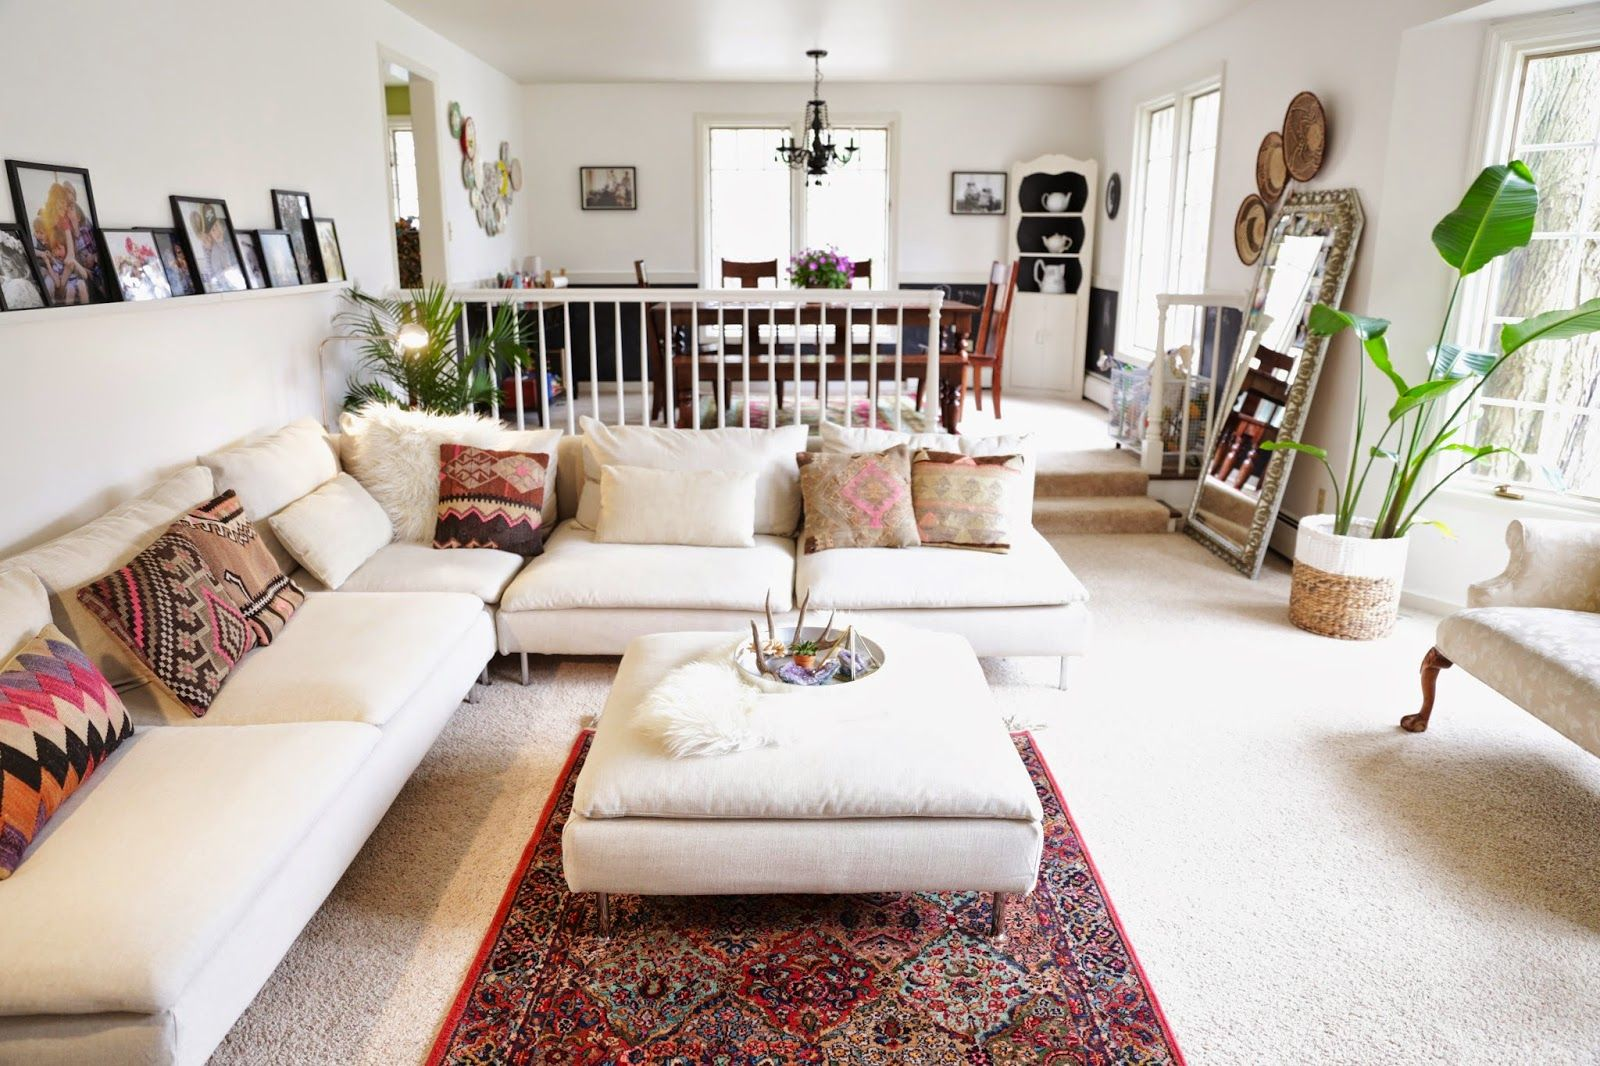 sofa ikea kivik opiniones cushion cover soderhamn review seccional pinterest